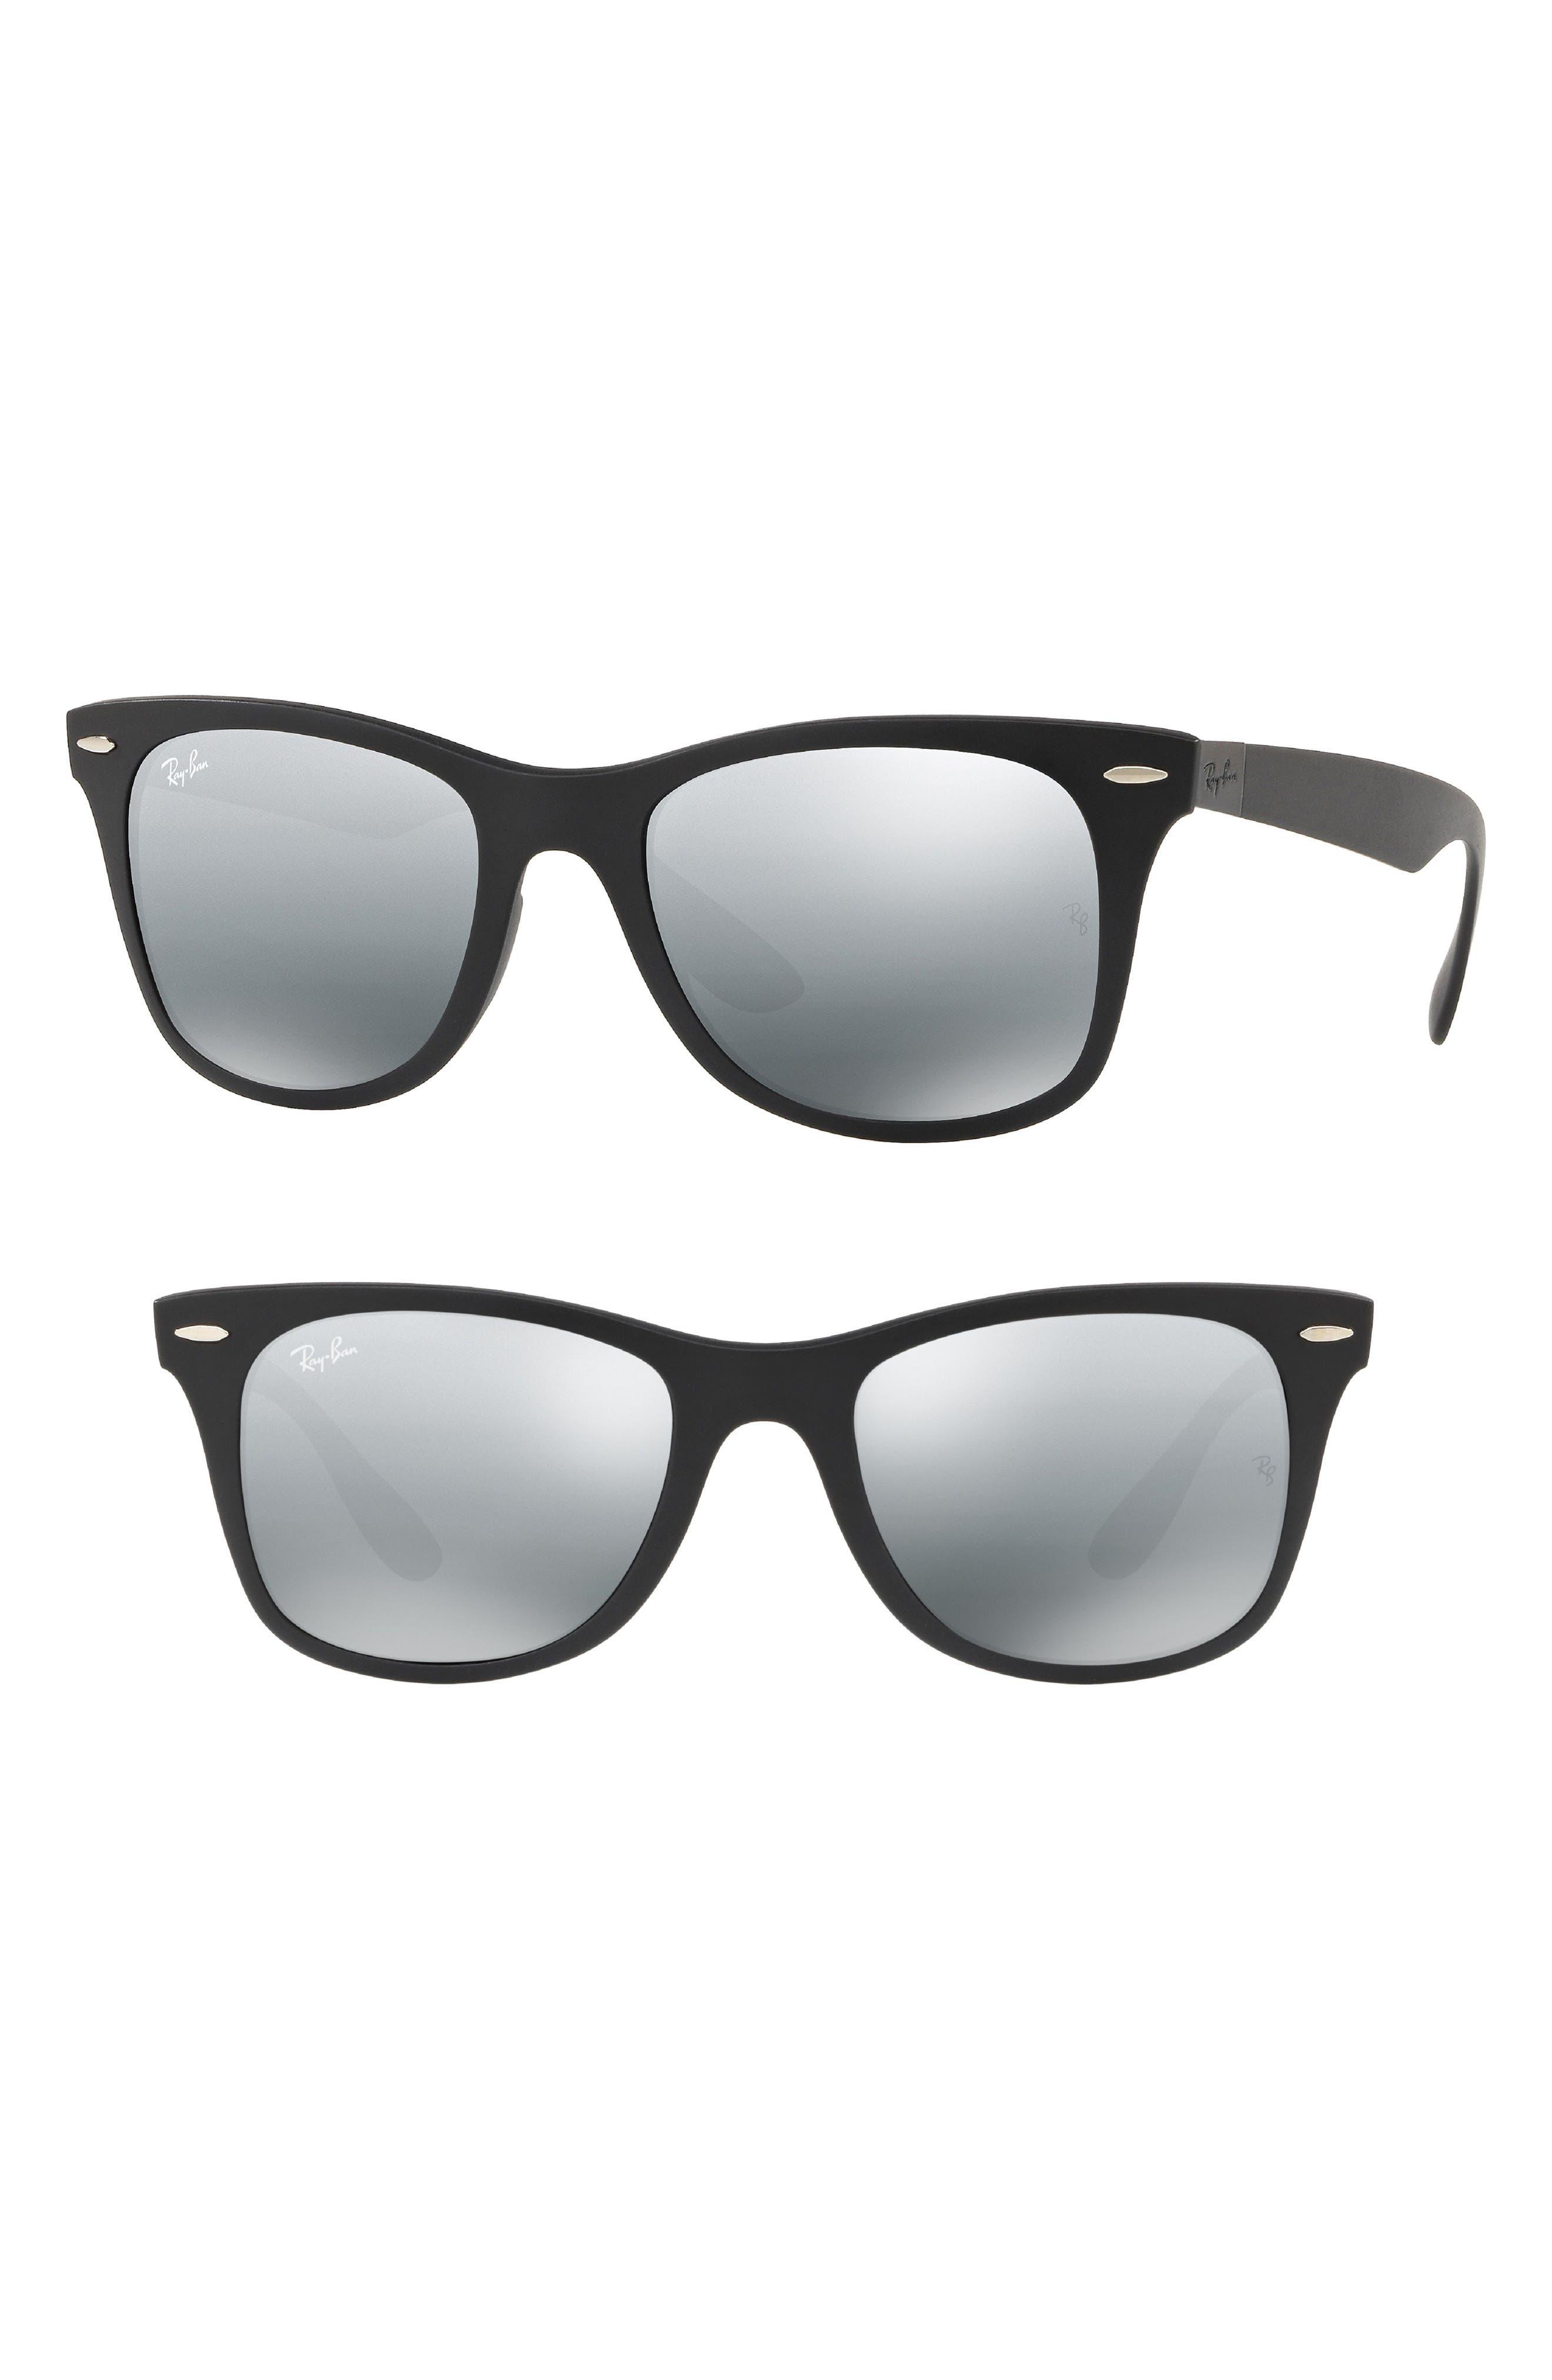 Tech Wayfarer Liteforce 52mm Sunglasses,                         Main,                         color, 001